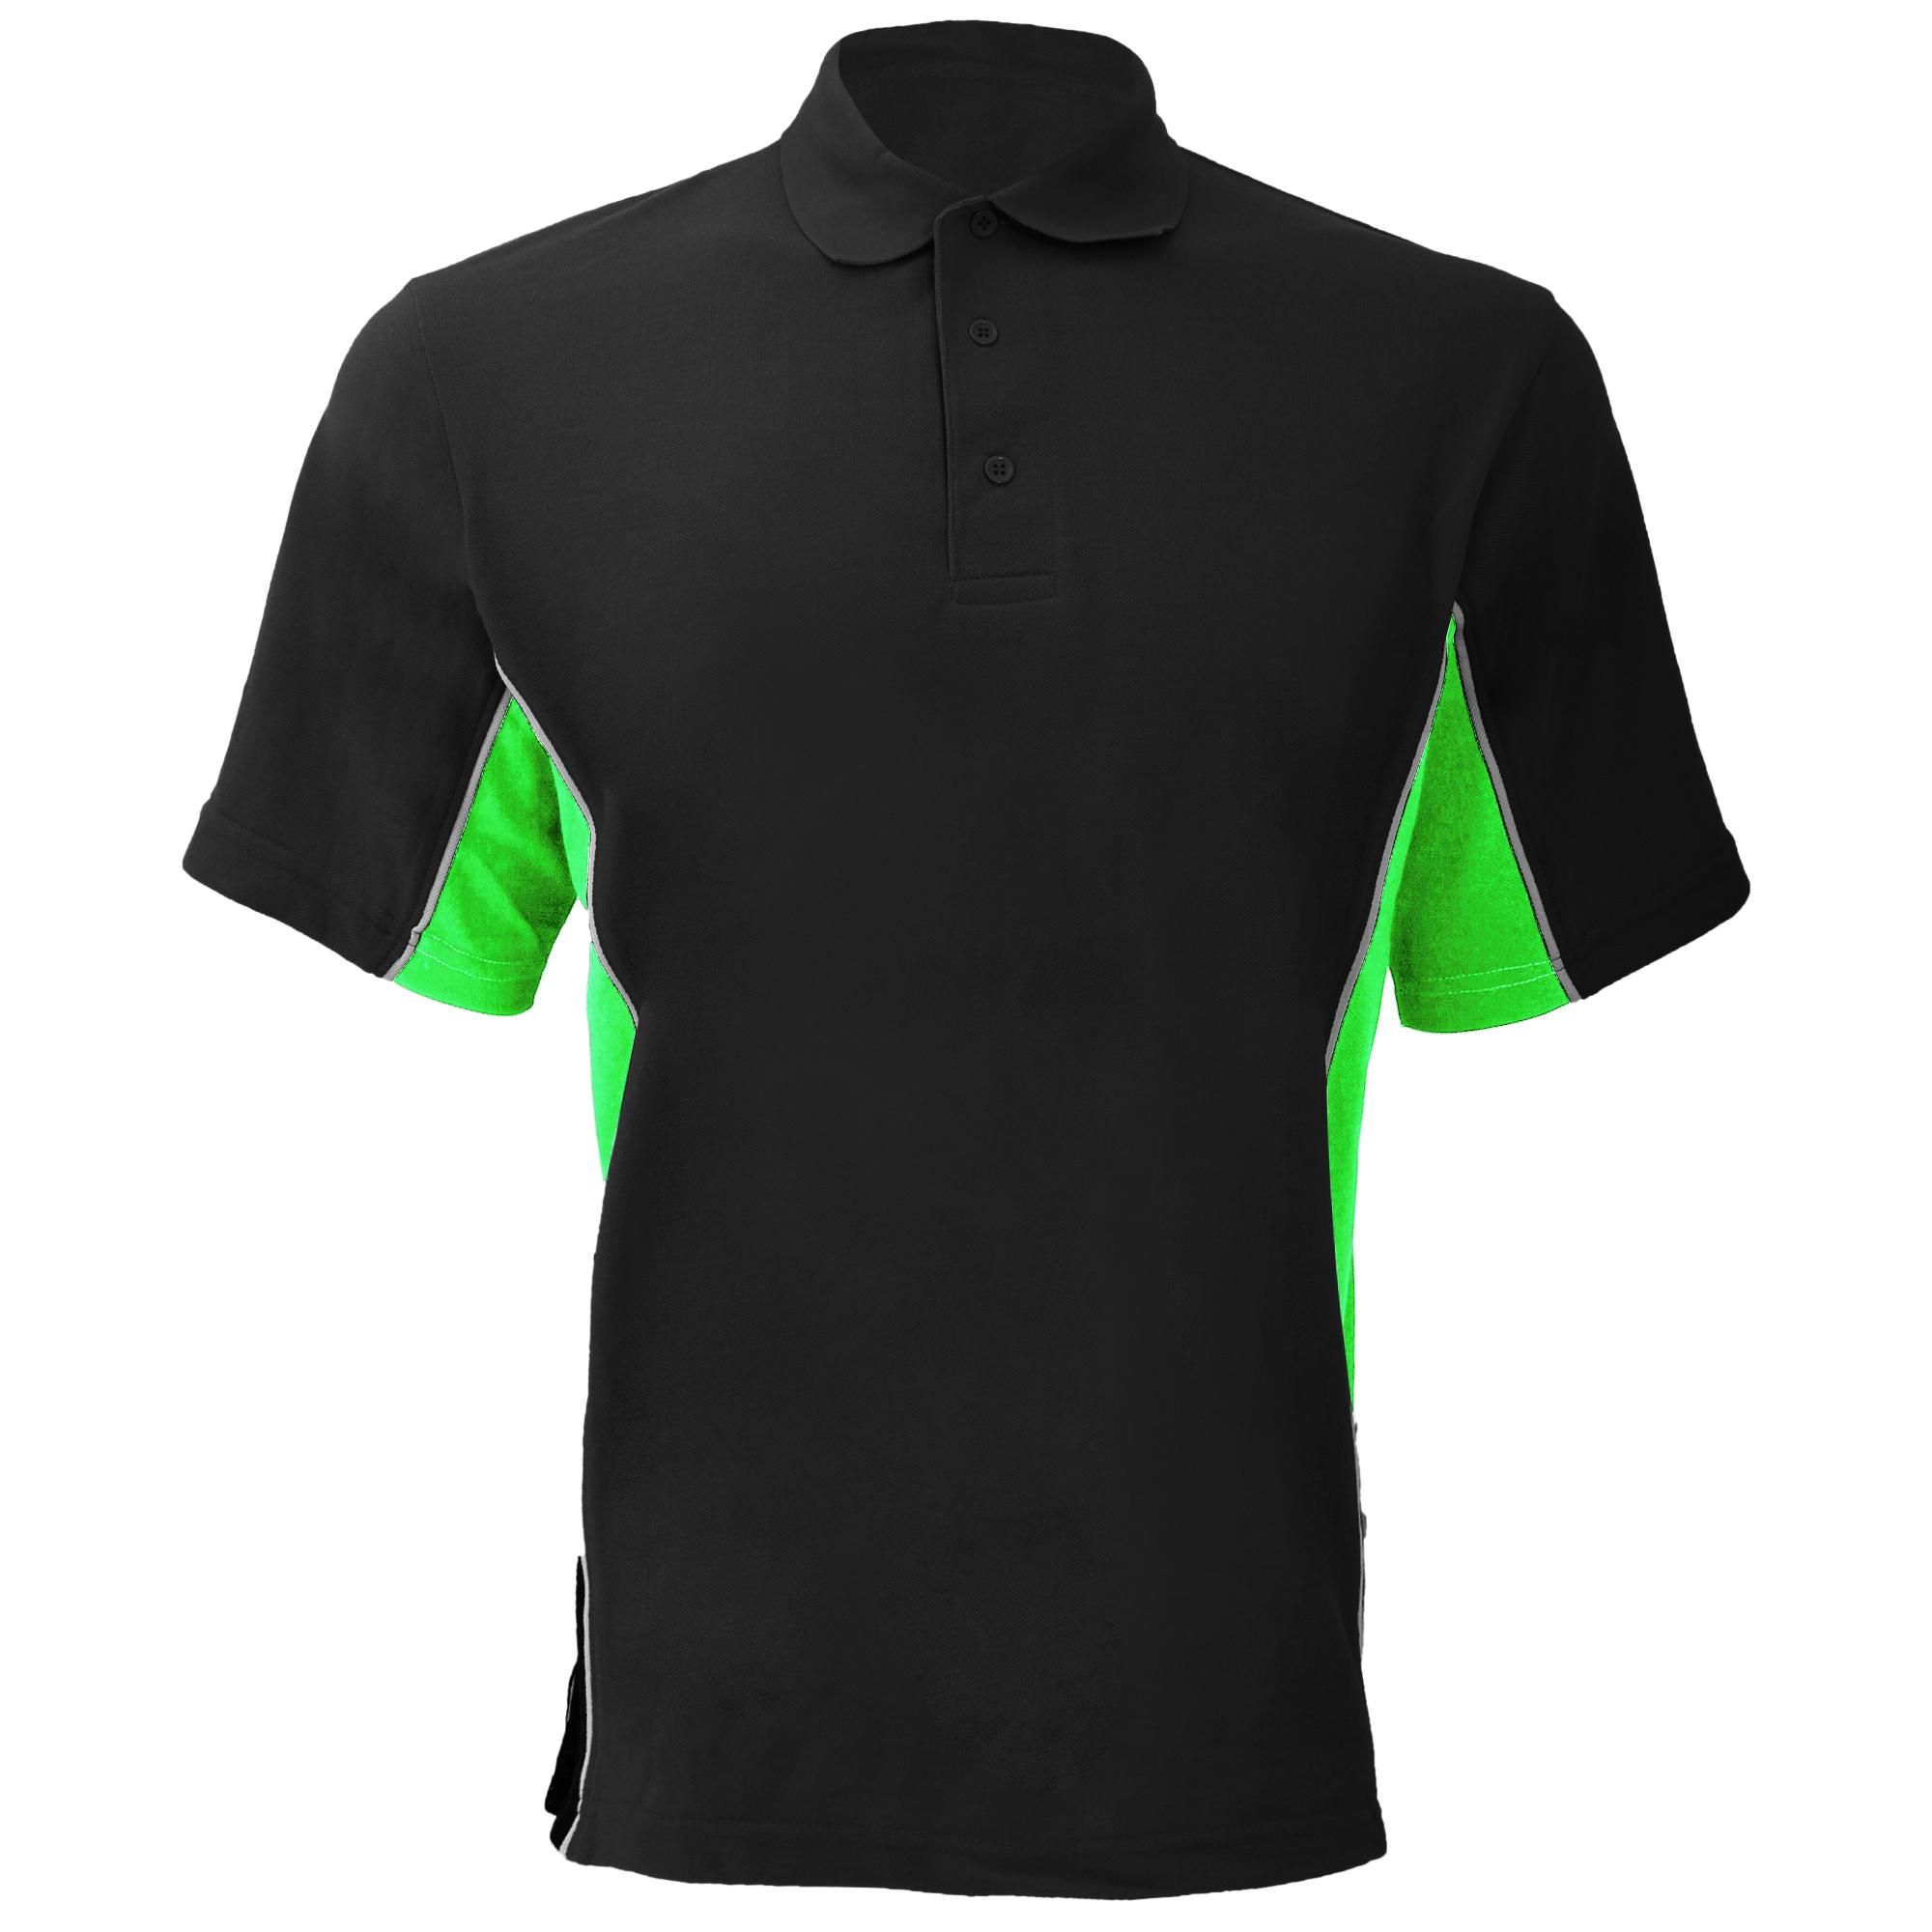 Gamegear® Mens Track Pique Short Sleeve Polo Shirt Top (S) (Navy/Light Blue/White)